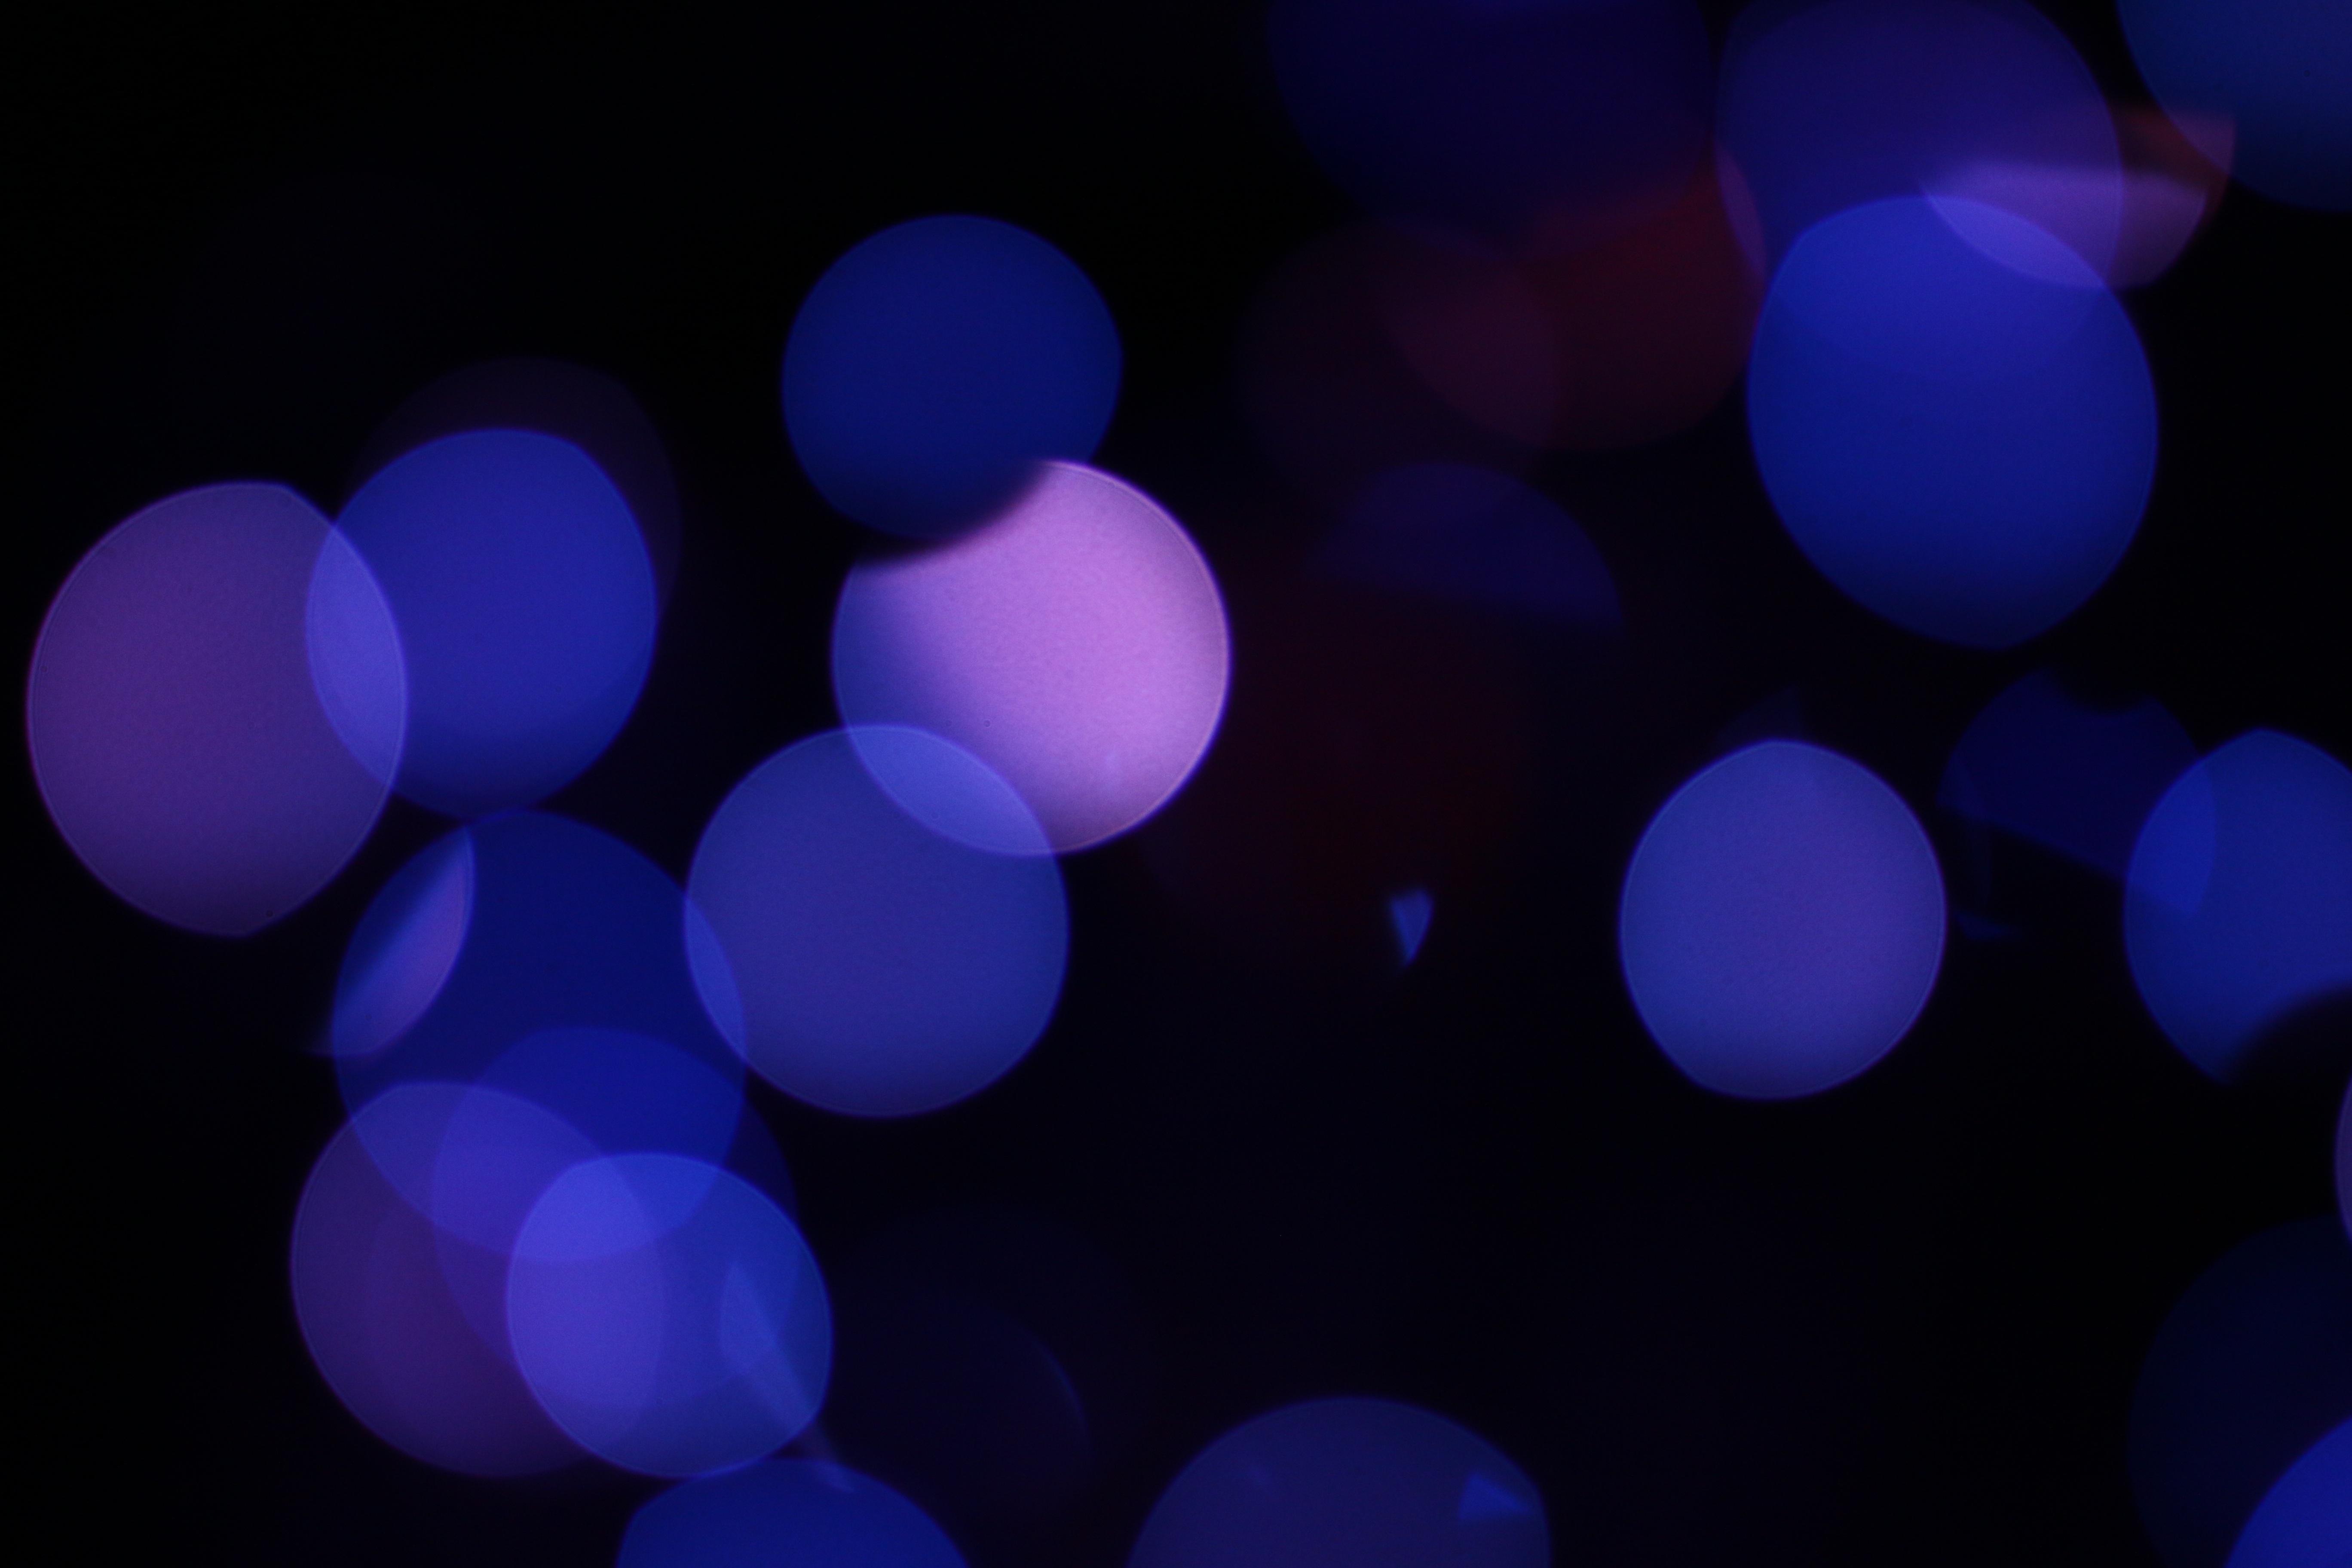 Download 920+ Background Ungu Biru Bunga HD Gratis